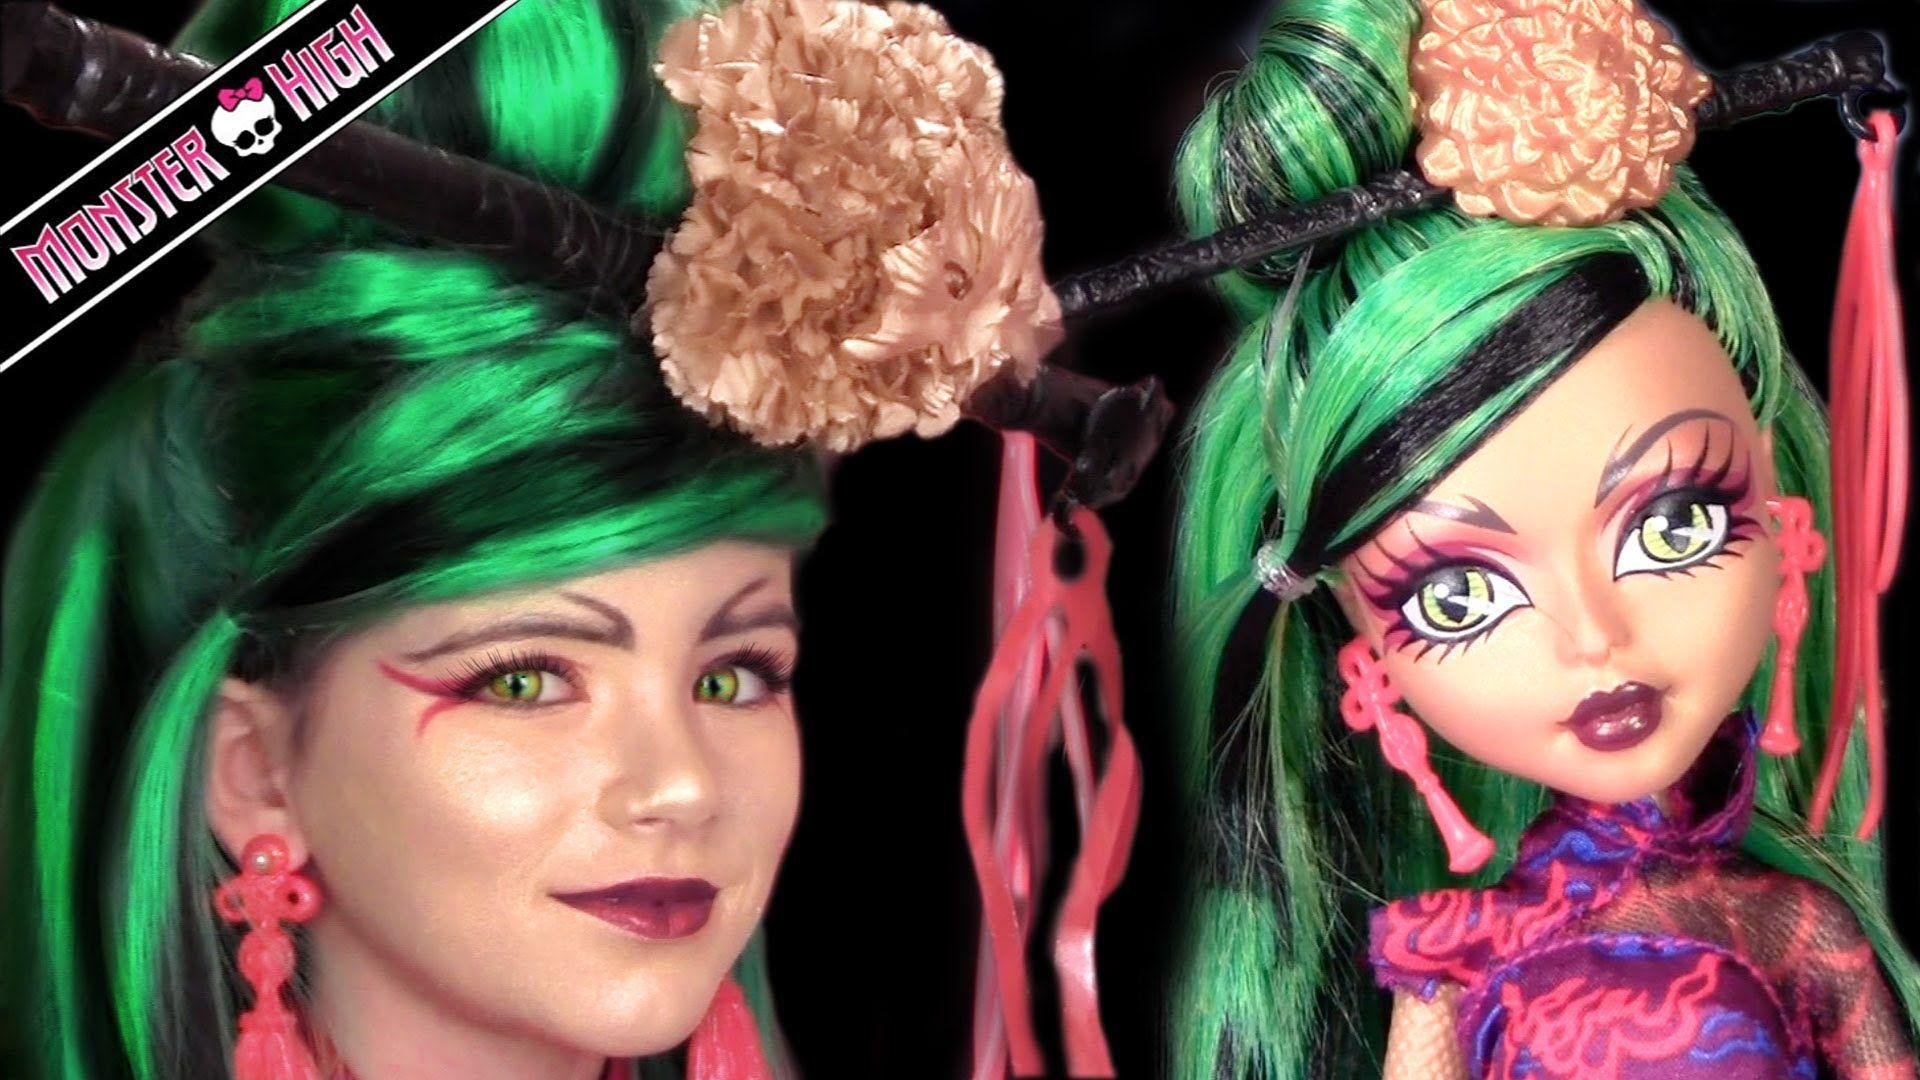 Jinafire long monster high doll costume makeup tutorial for cosplay jinafire long monster high doll costume makeup tutorial for cosplay or h baditri Images